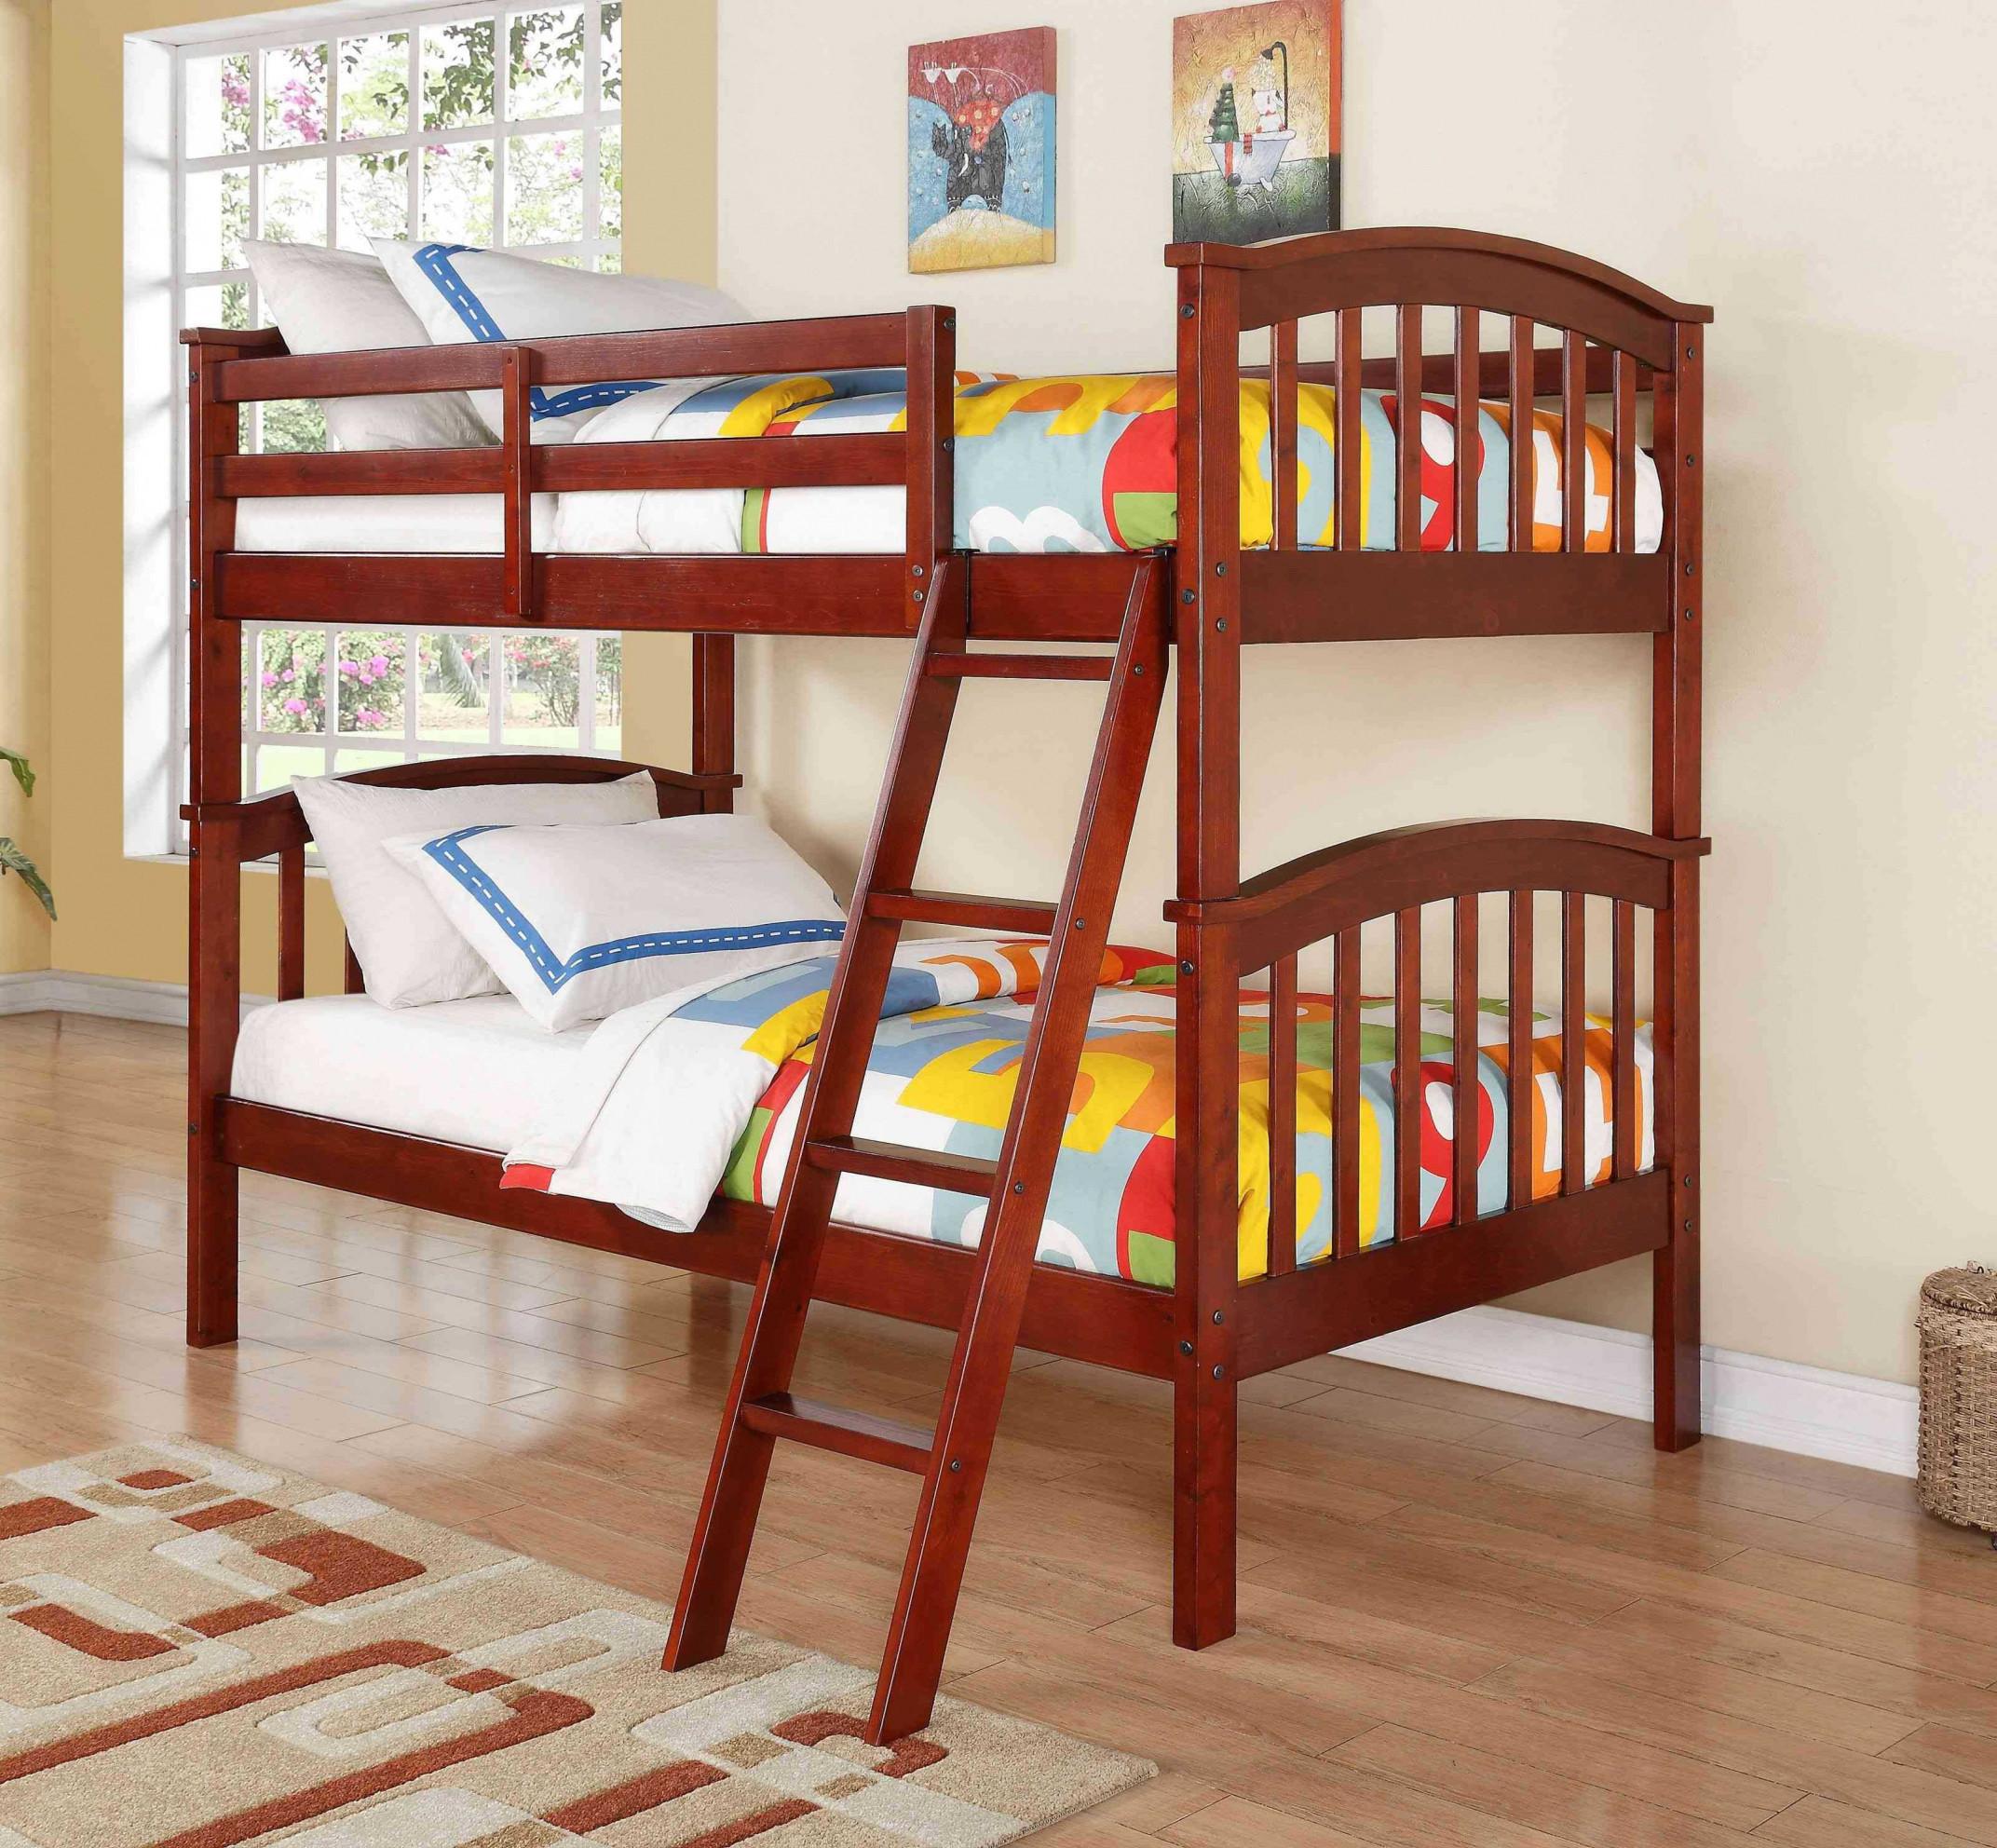 ikea hardwood flooring usa of trundle bedroom set ikea black bed frame luxury ikea futonbett 0d in home design